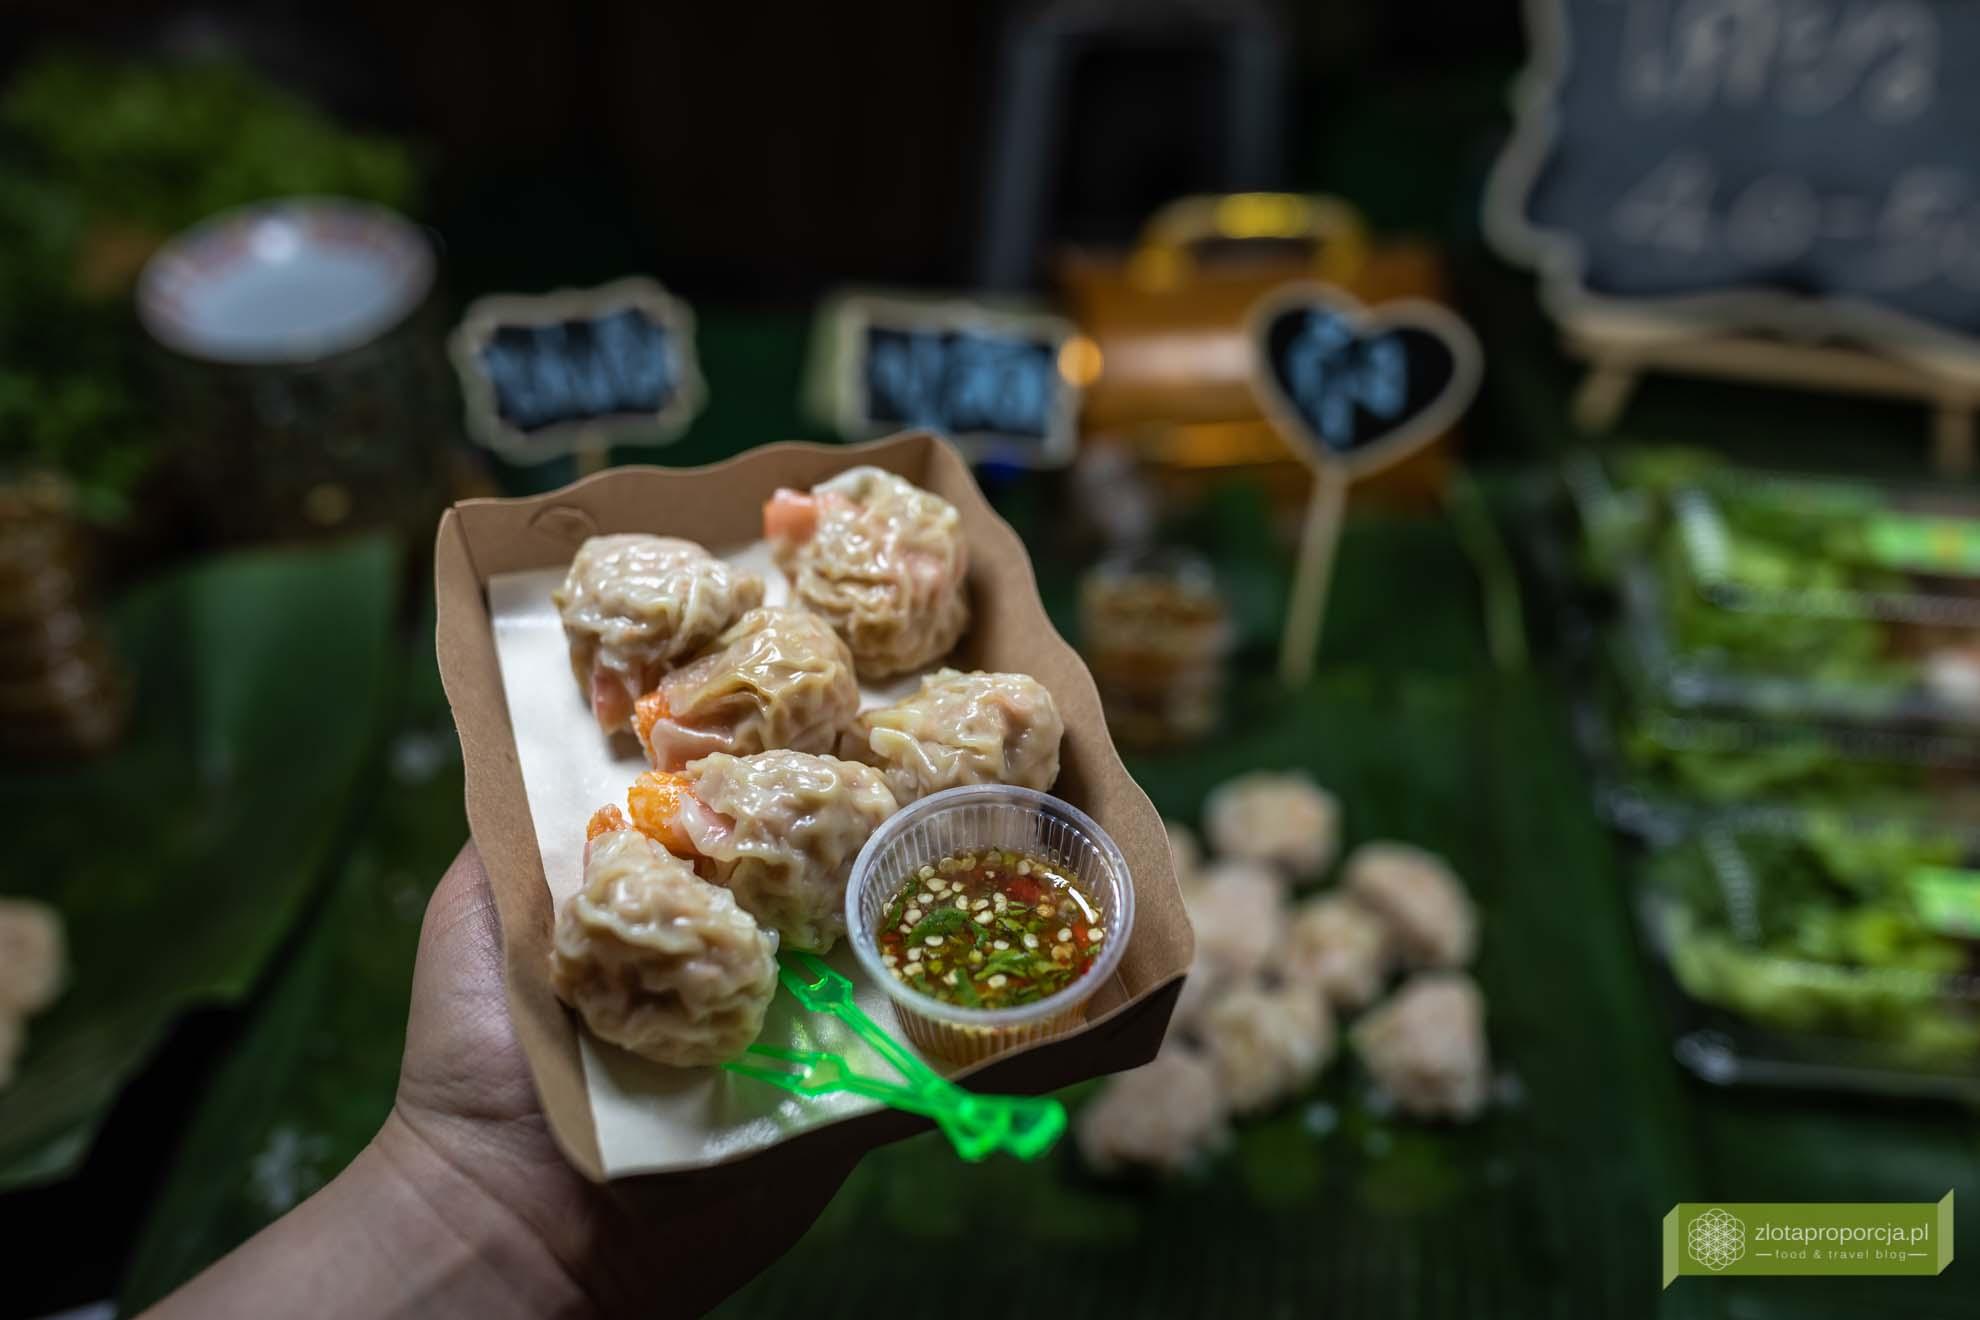 Bangkok; atrakcje Bangkoku; bangkok pływający targ; Bangkok floating market; kanały Bangkoku; Khlong Lat Mayom Floating Market; Khlong Lat Mayom;